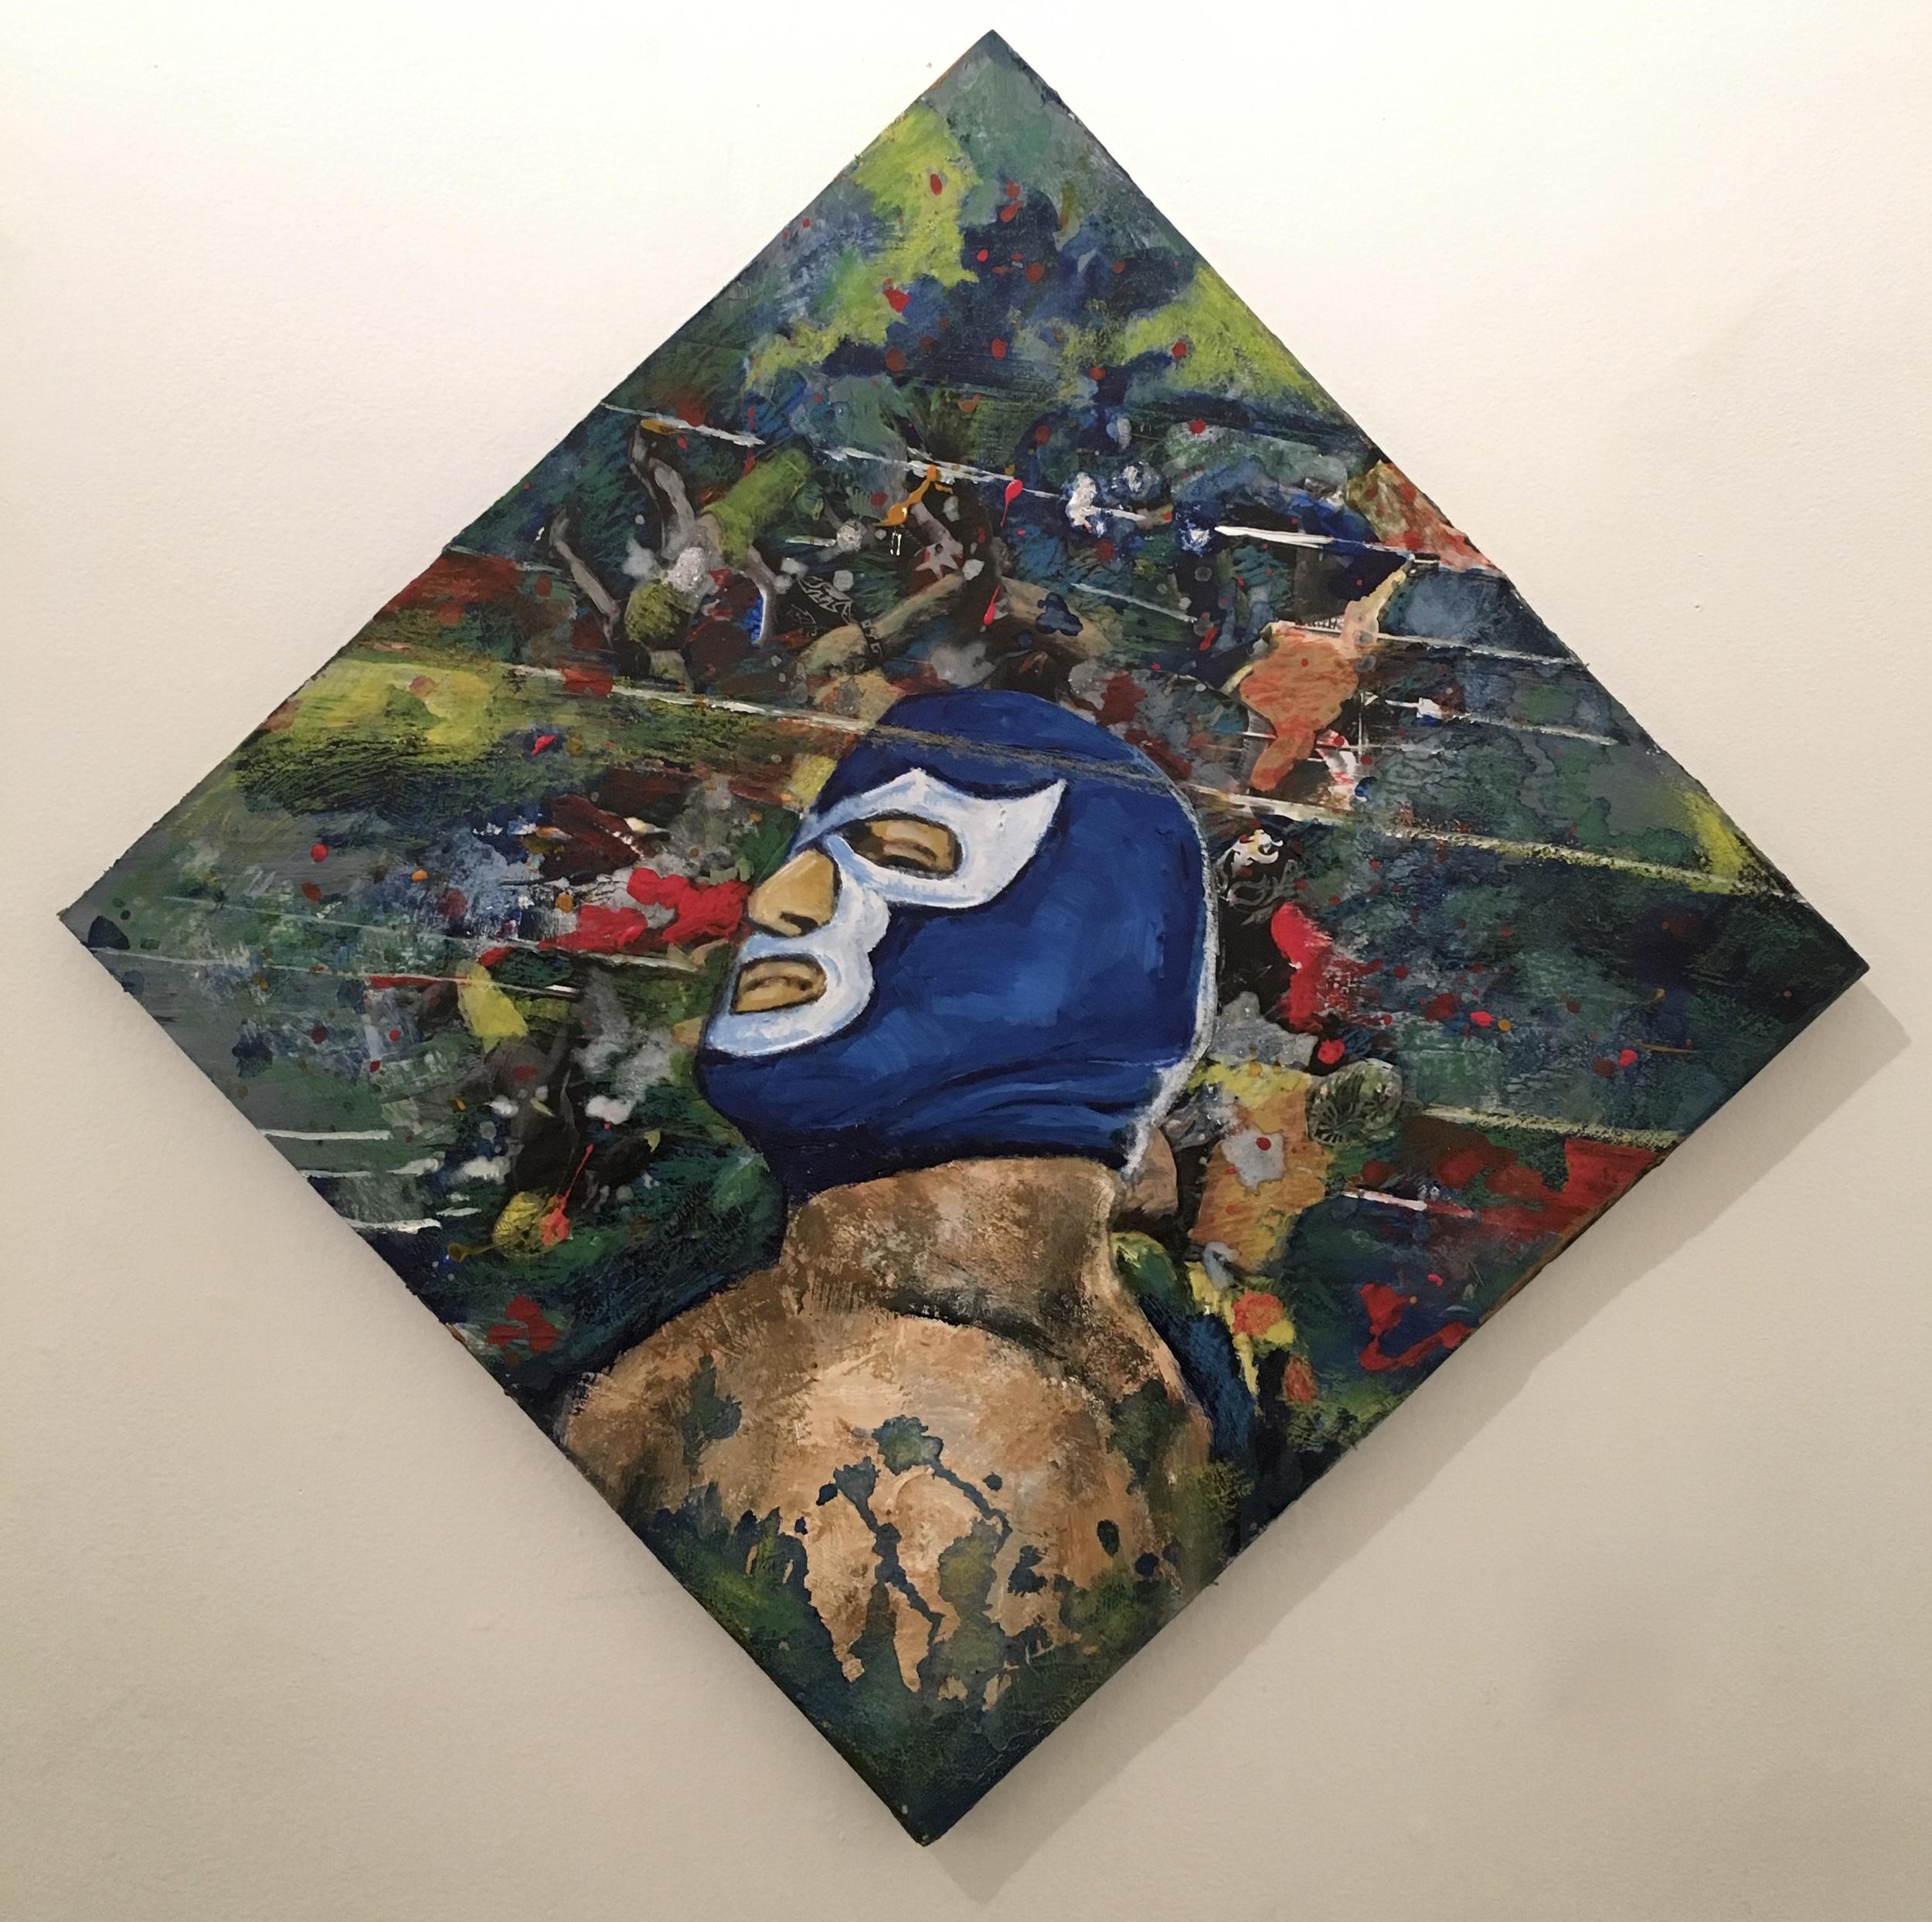 Tribute to Blue Demon by Michael Massenburg